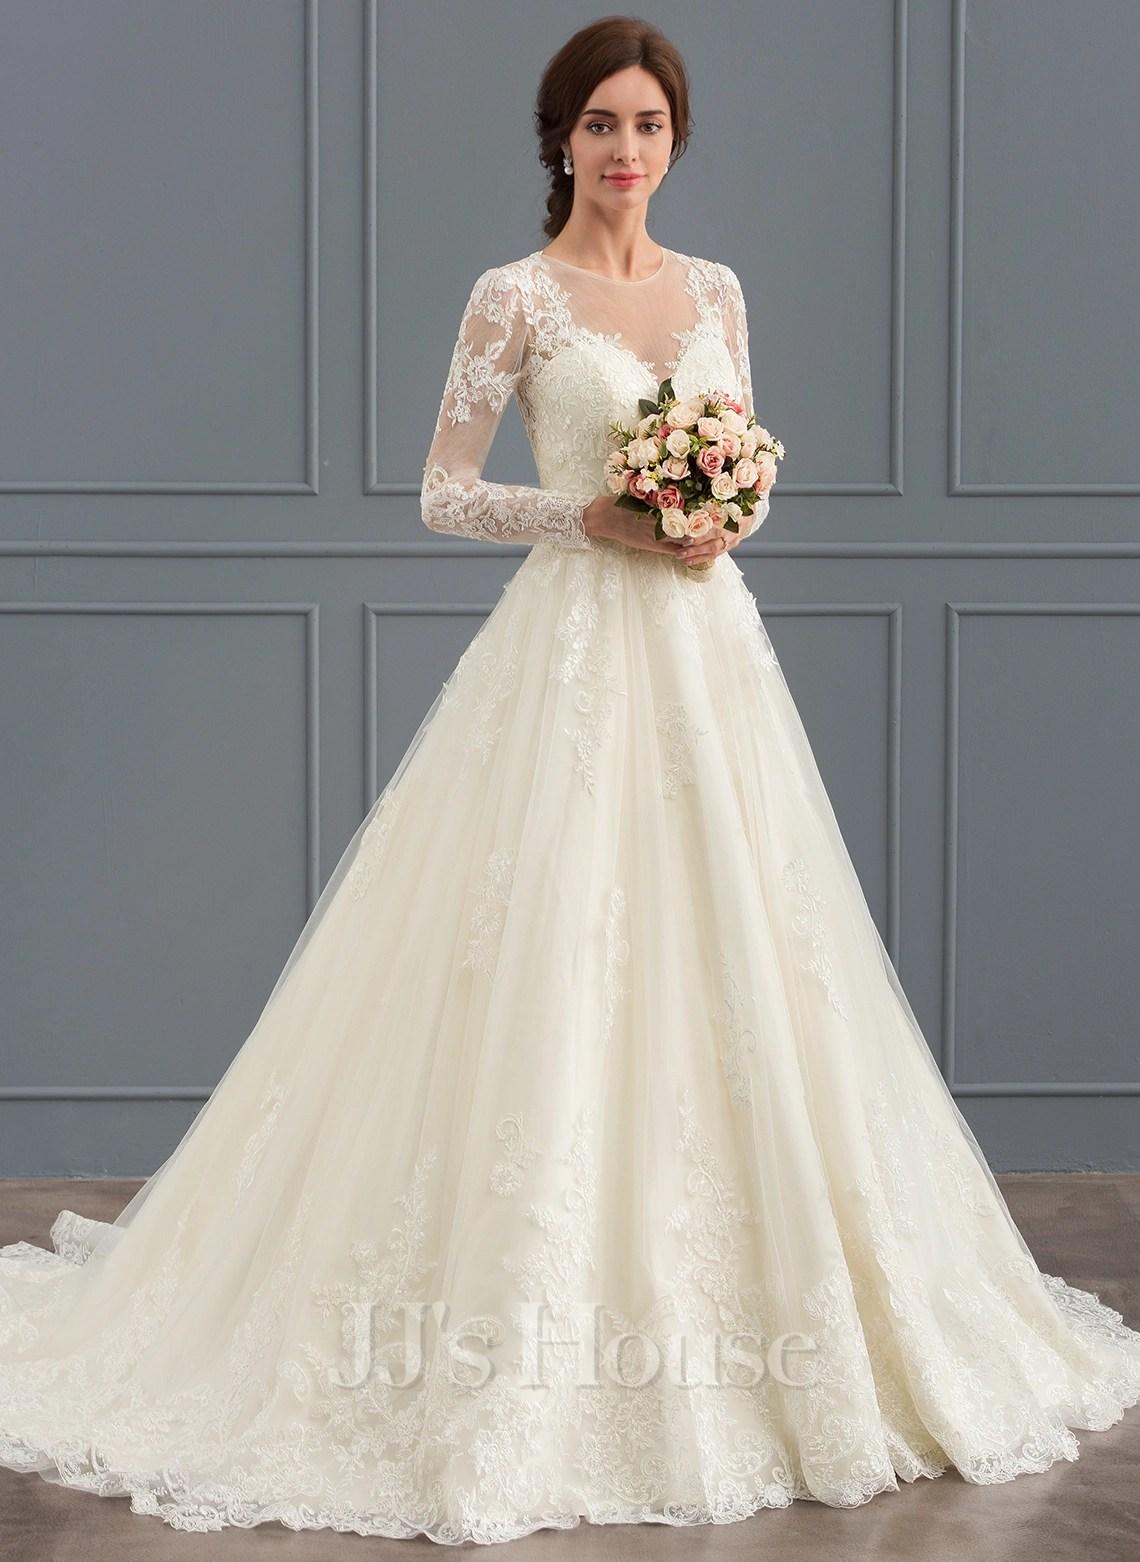 BallGown Scoop Neck Court Train Tulle Lace Wedding Dress 002127273  Wedding Dresses  JJs House